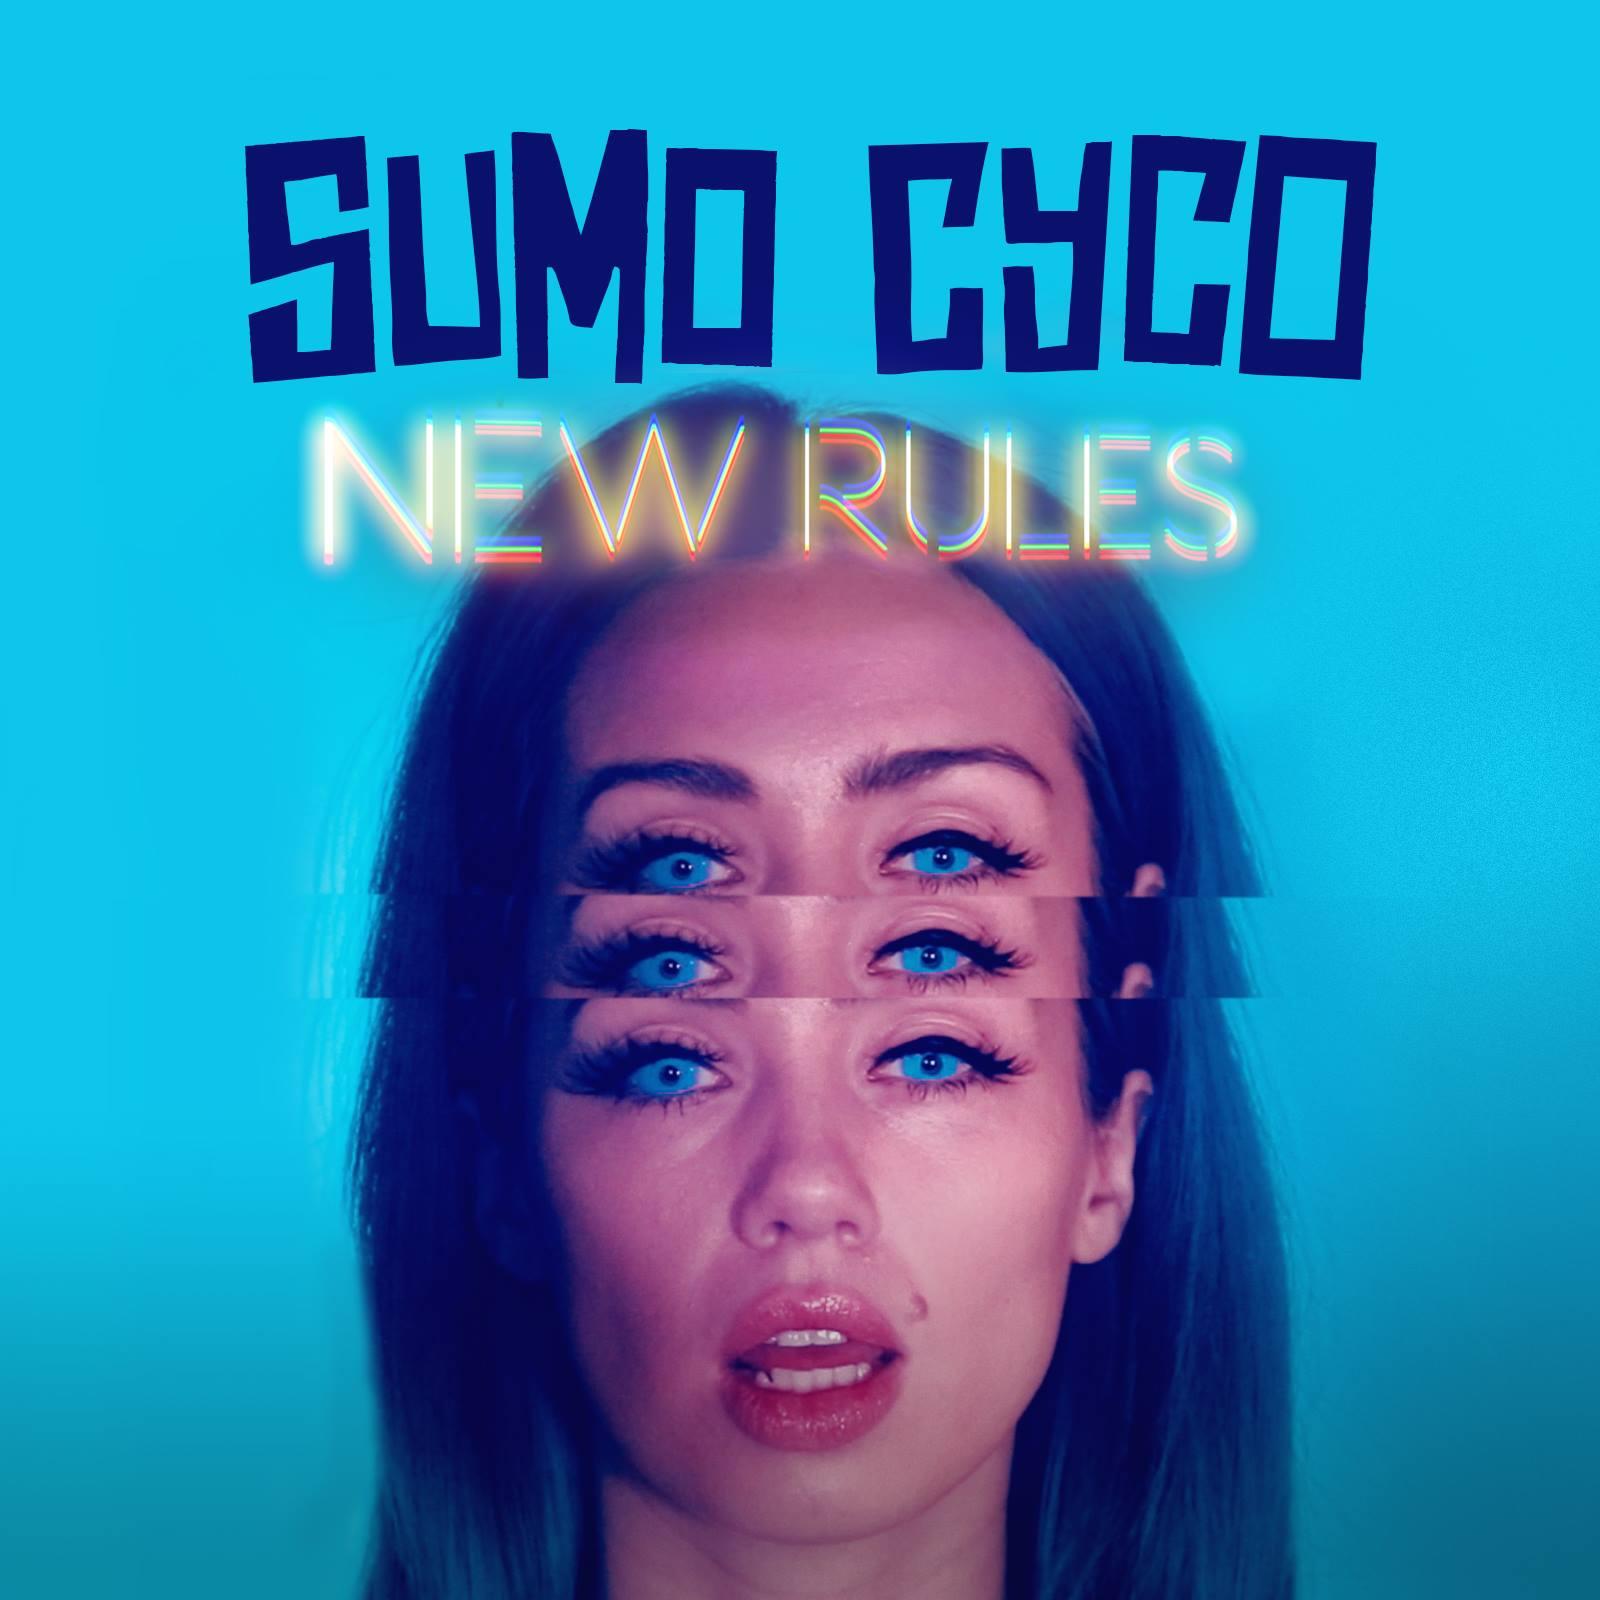 New Rules - Single